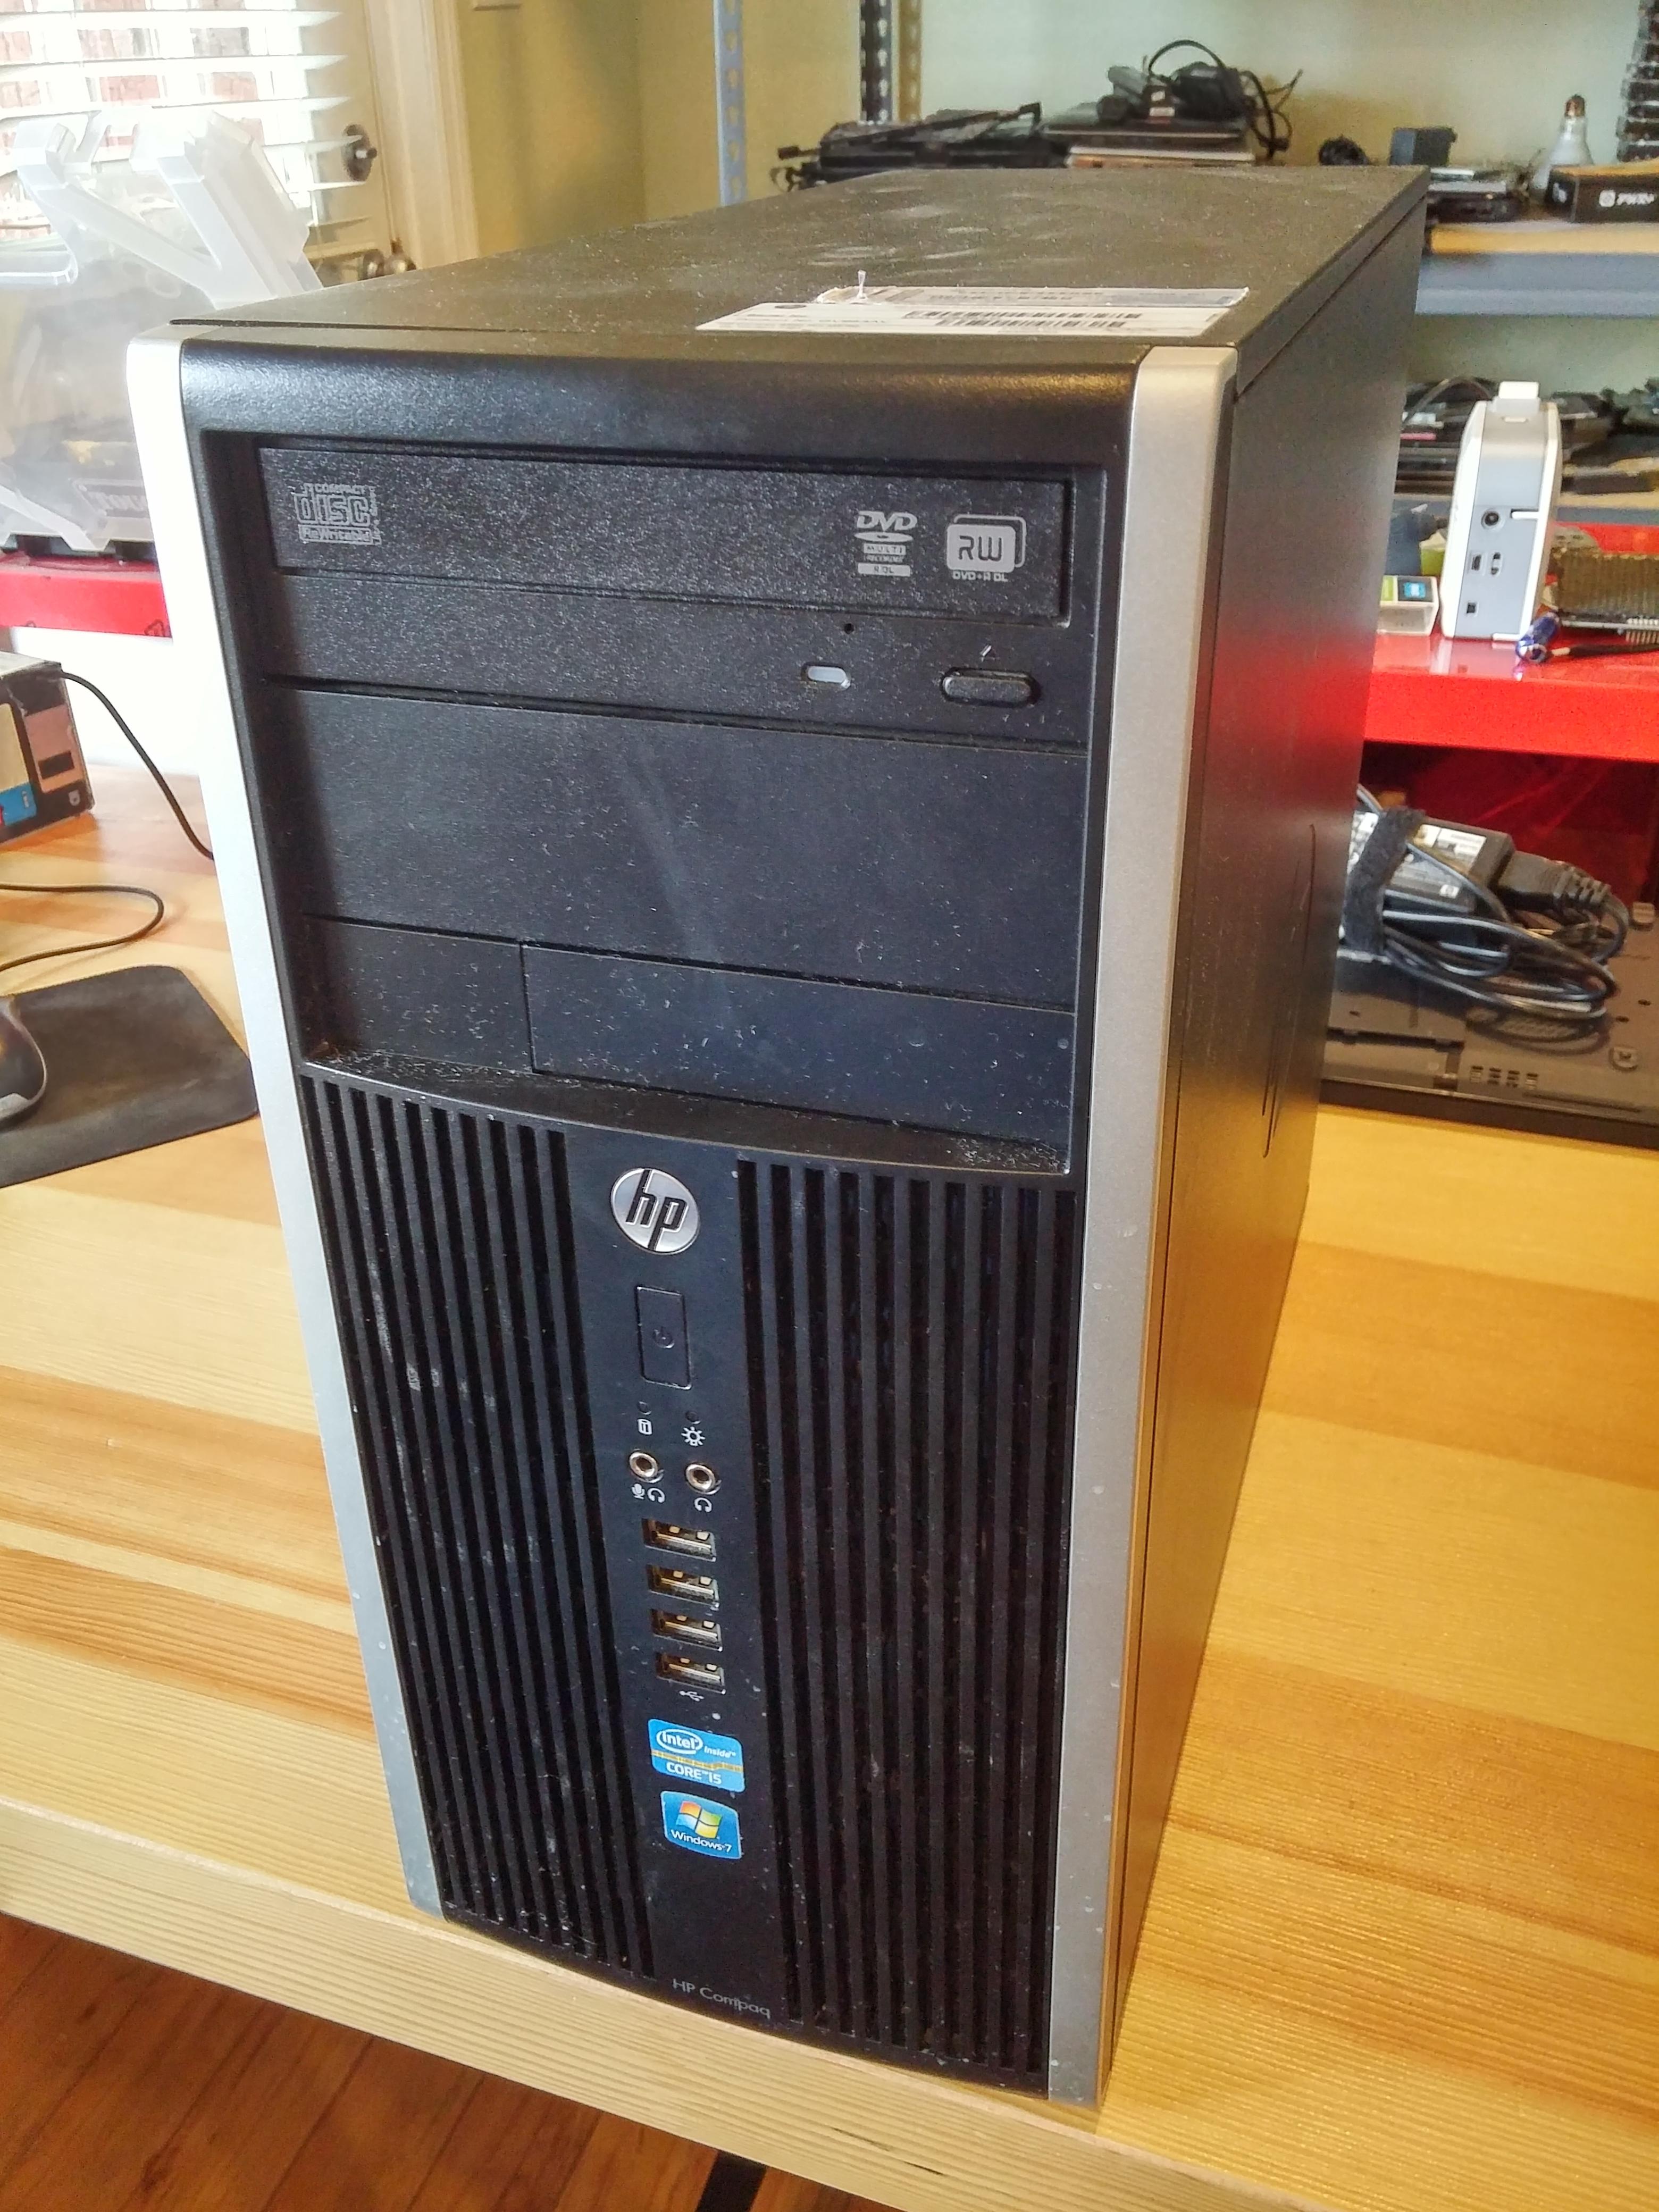 HP Pro 6300 Computer